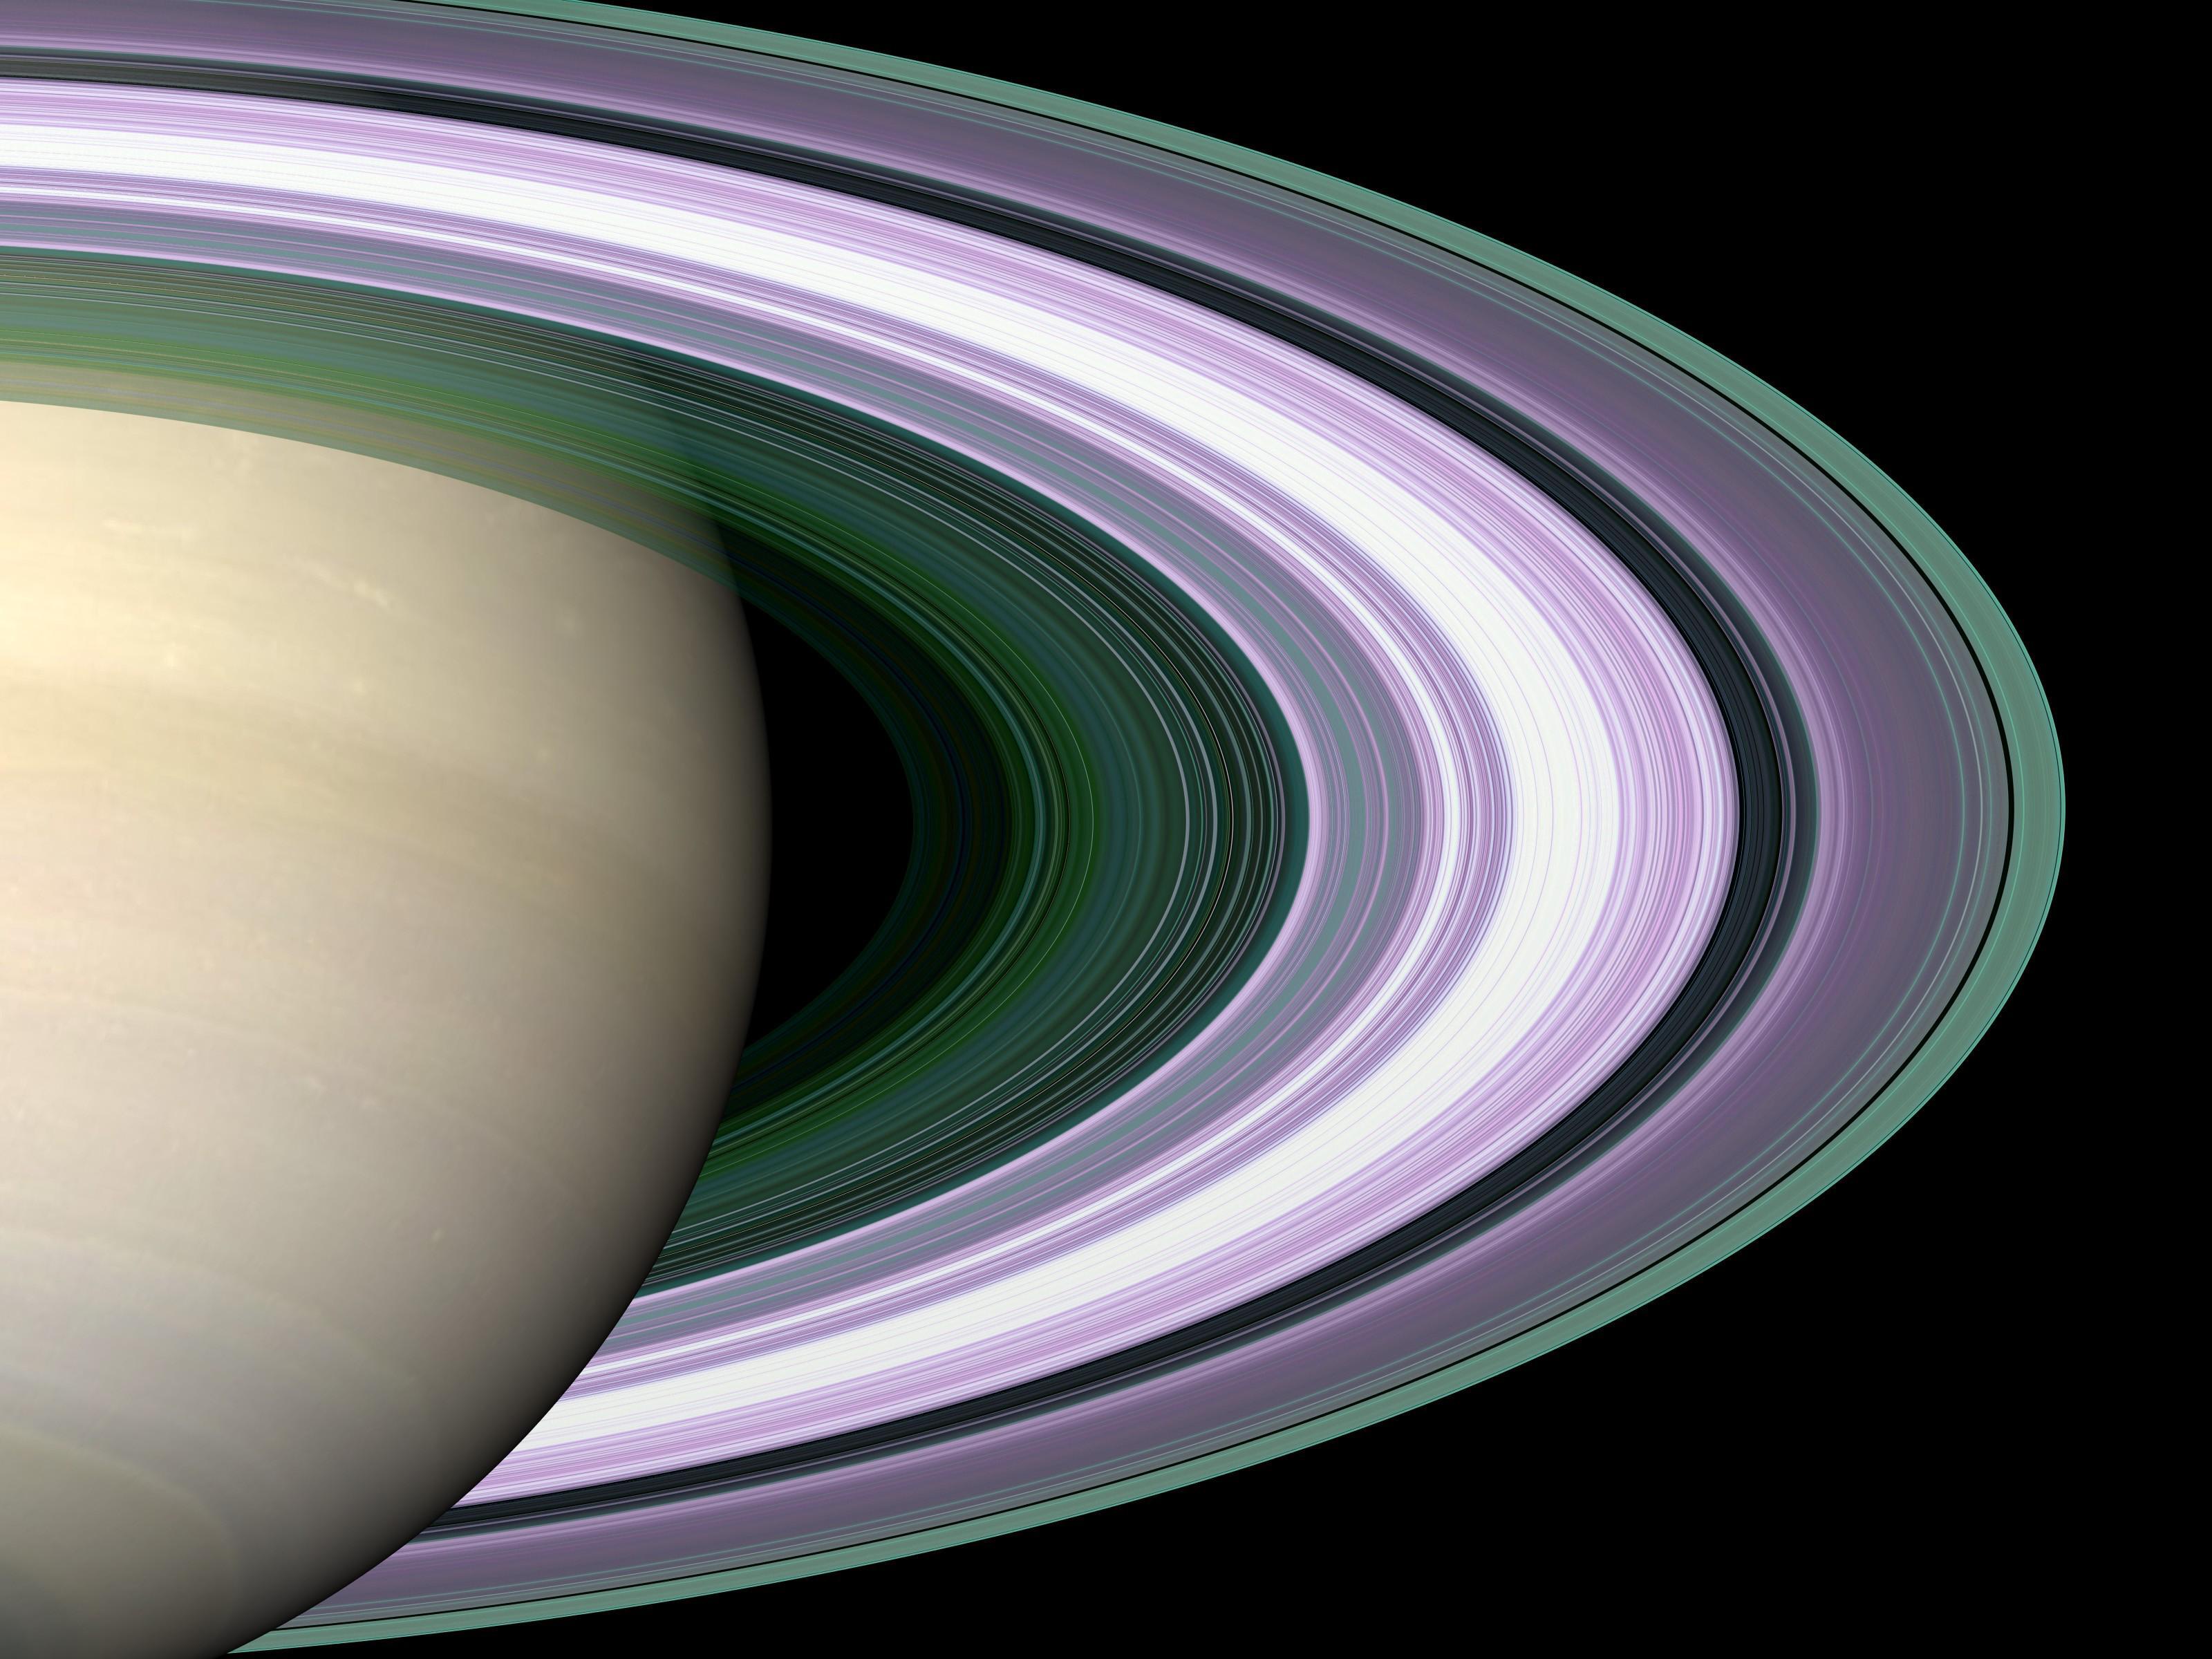 cassini saturn rings close up - photo #34